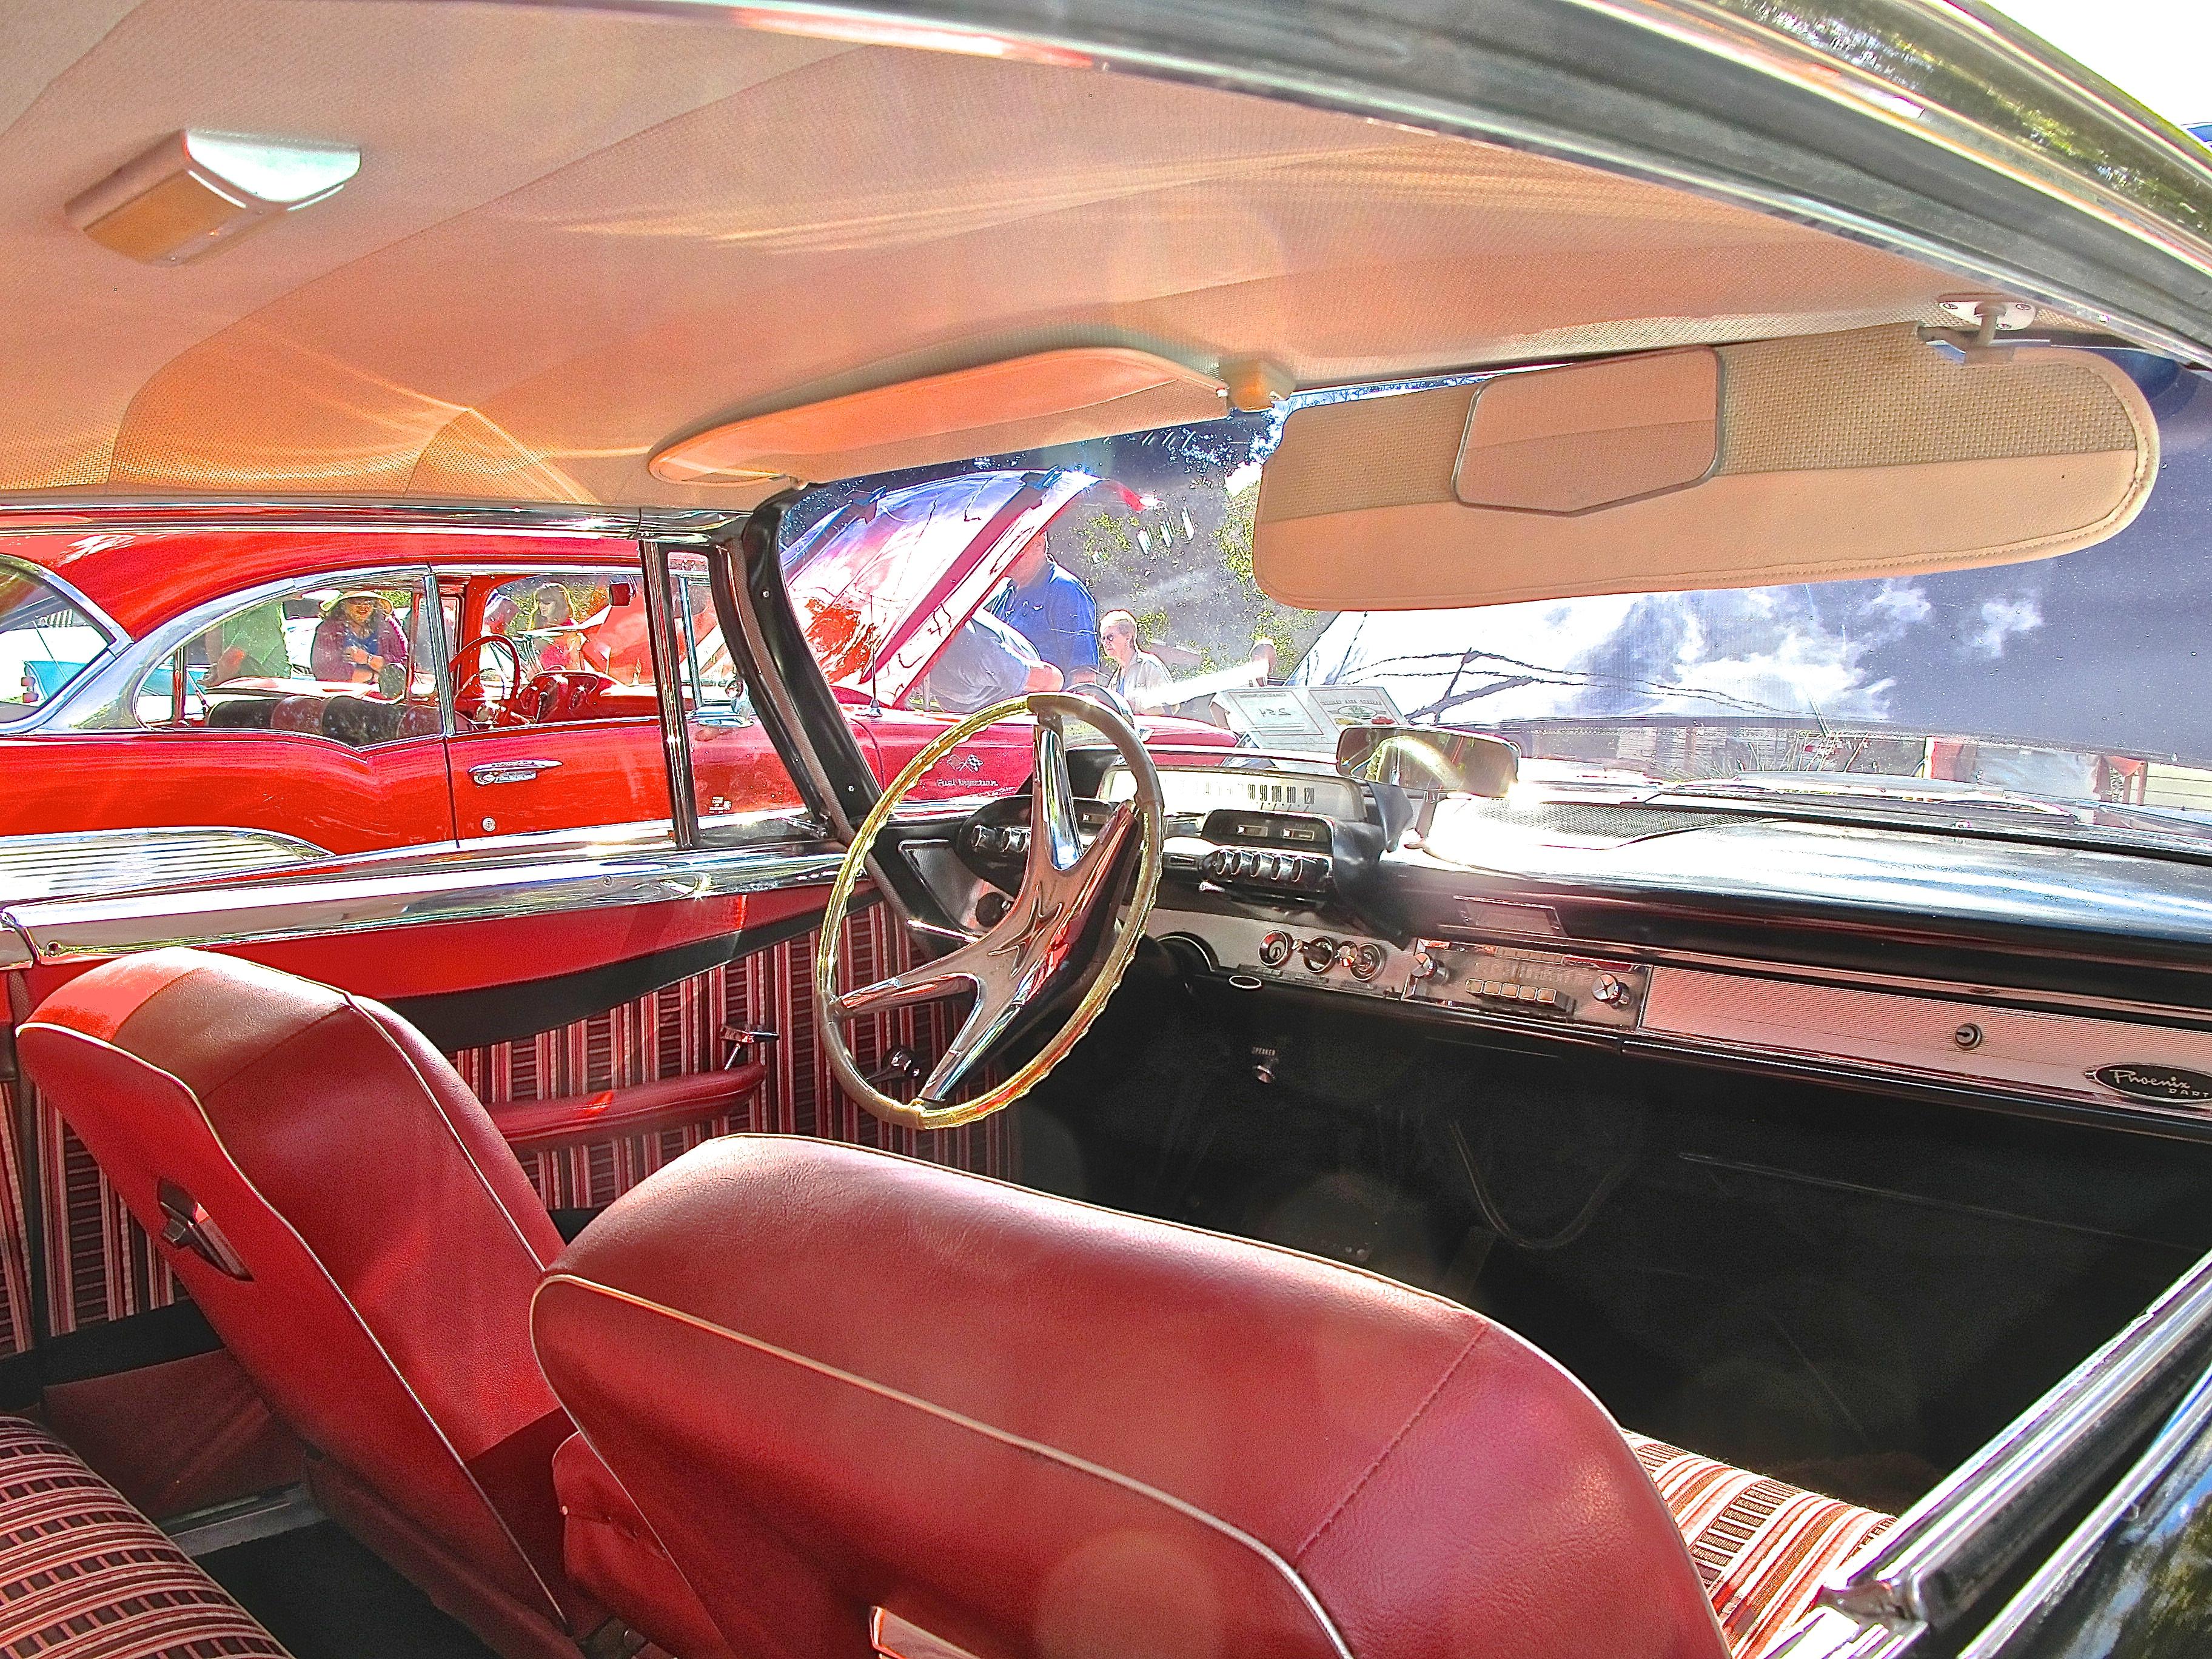 Cars For Sale Austin Tx >> Rare 1960 Dodge Dart Phoenix at Yesterday's Bastrop Car ...